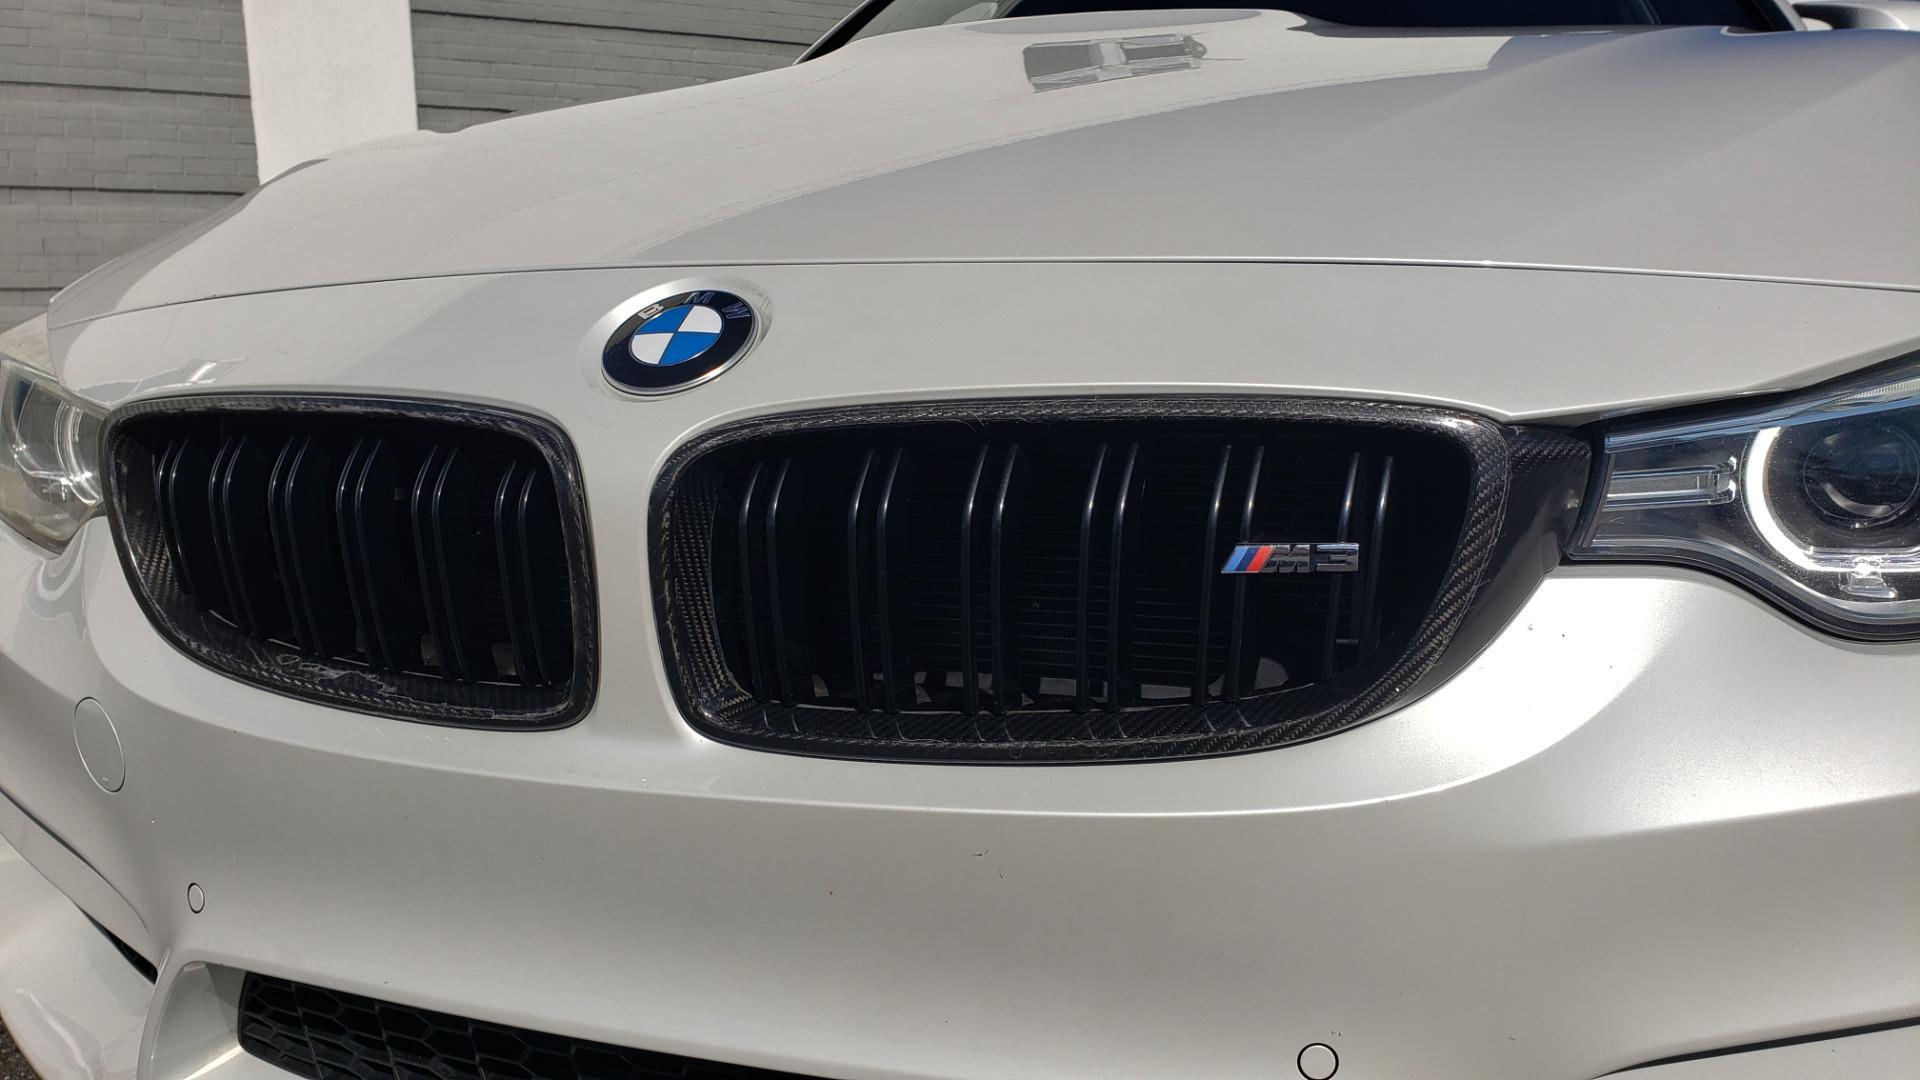 Used 2016 BMW M3 SEDAN / EXECUTIVE PKG / M-SUSPENSION / HARMAN/KARDON SOUND for sale Sold at Formula Imports in Charlotte NC 28227 19